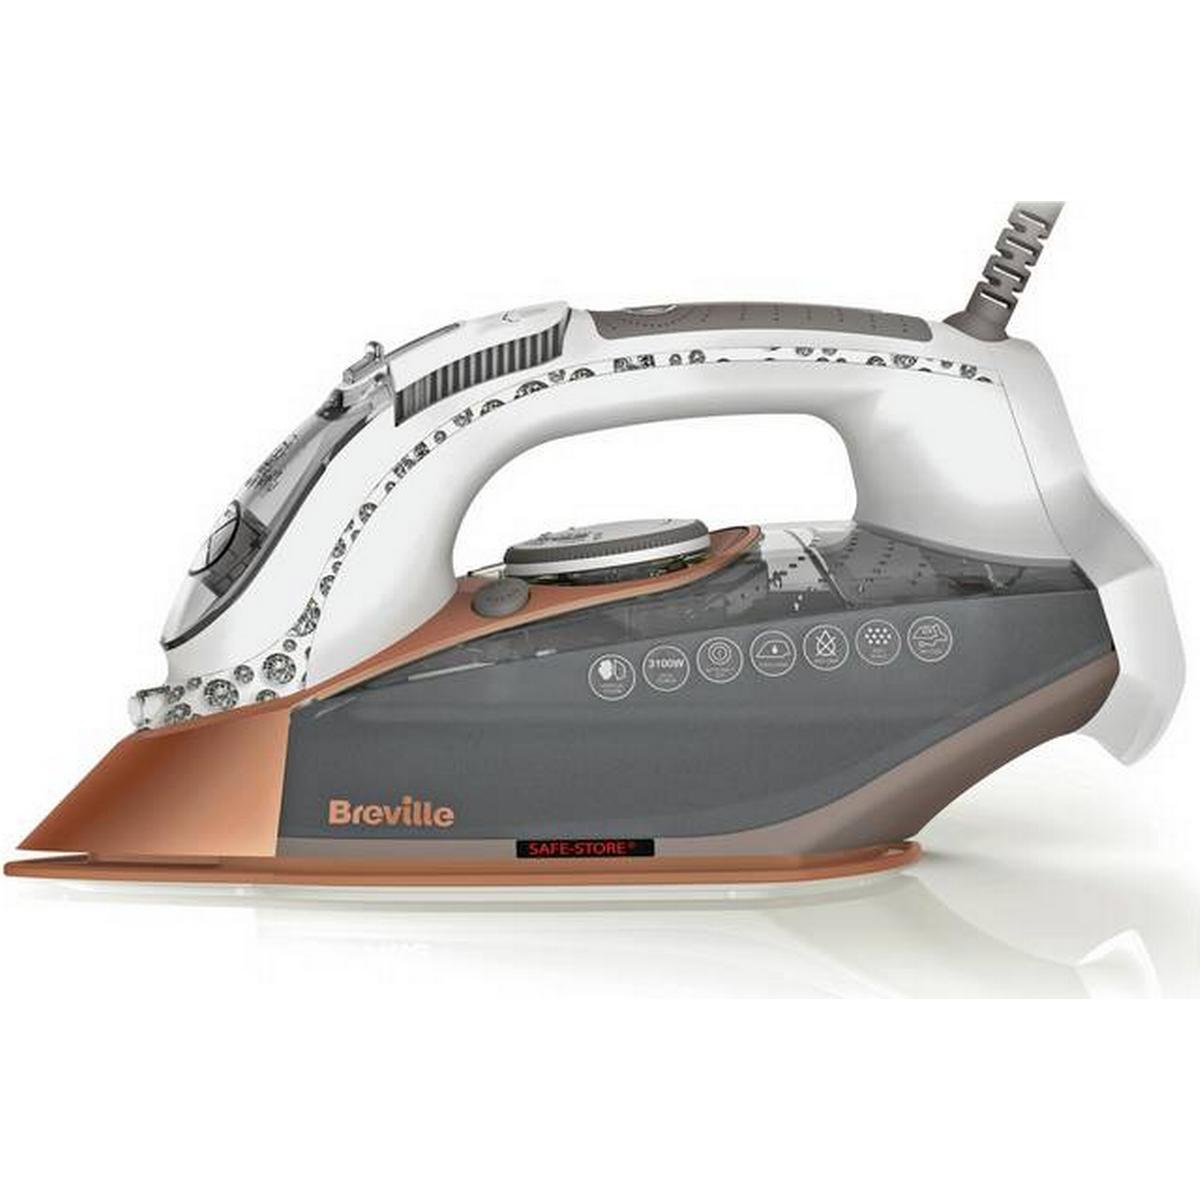 2200 W Breville VIN369 Easy Glide Iron